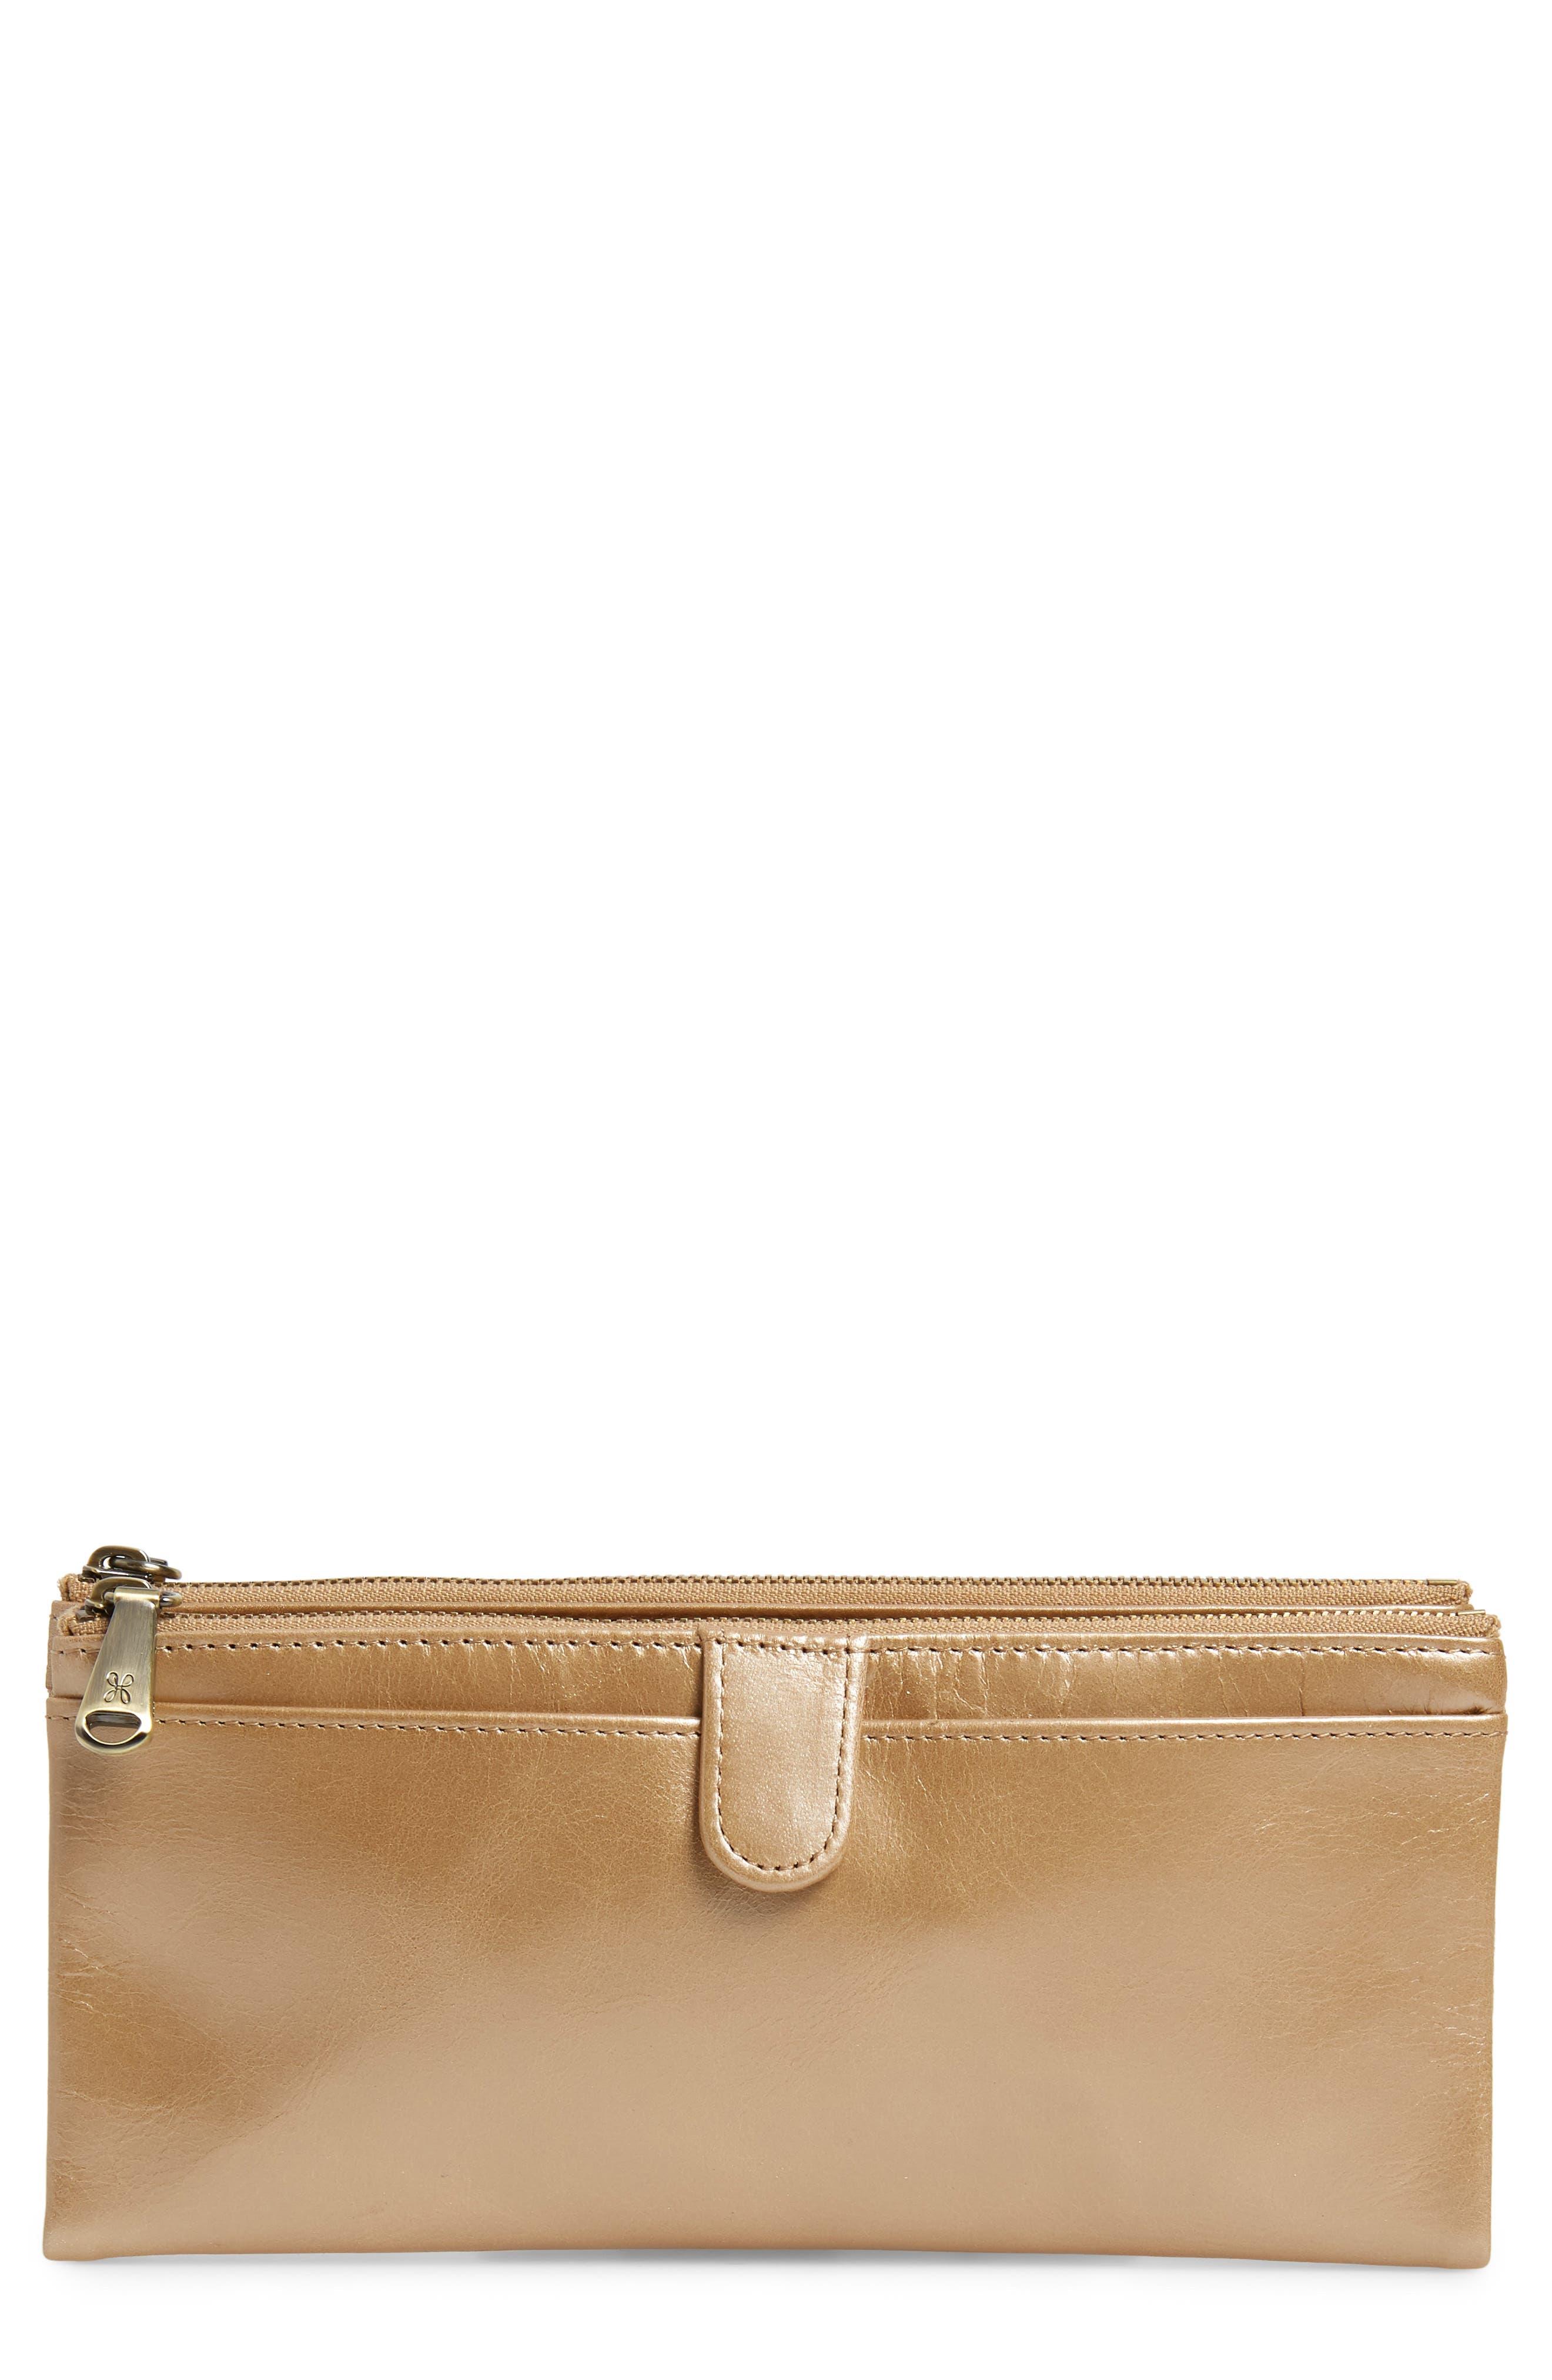 Alternate Image 1 Selected - Hobo 'Taylor' Glazed Leather Wallet